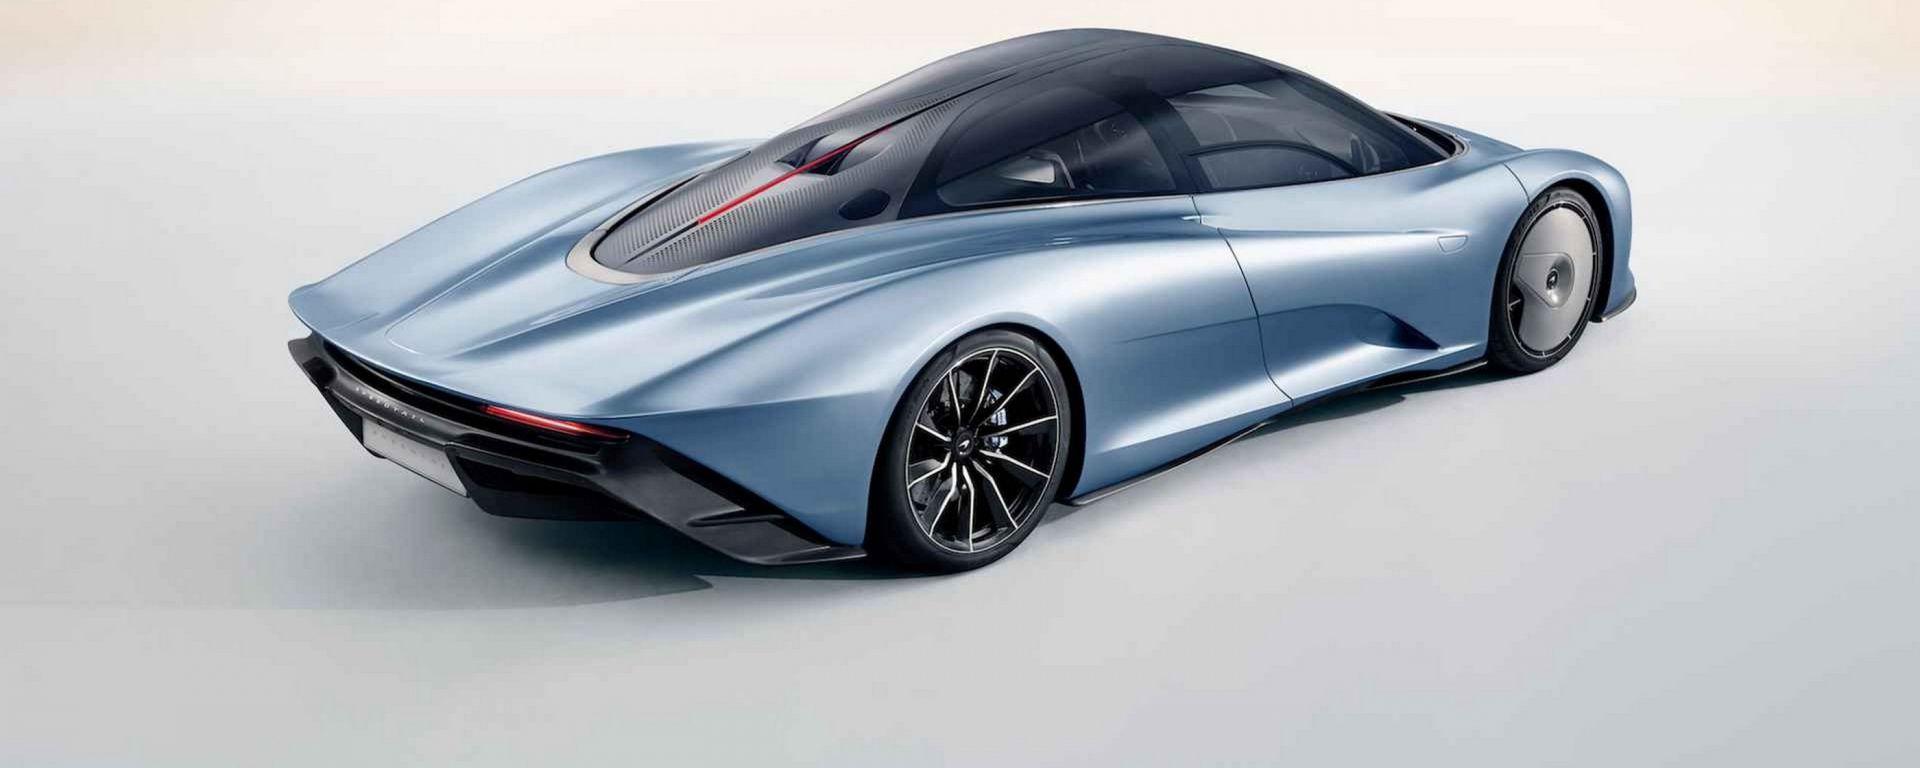 McLaren Speedtail: ecco l'erede della F1 da 400 km/h